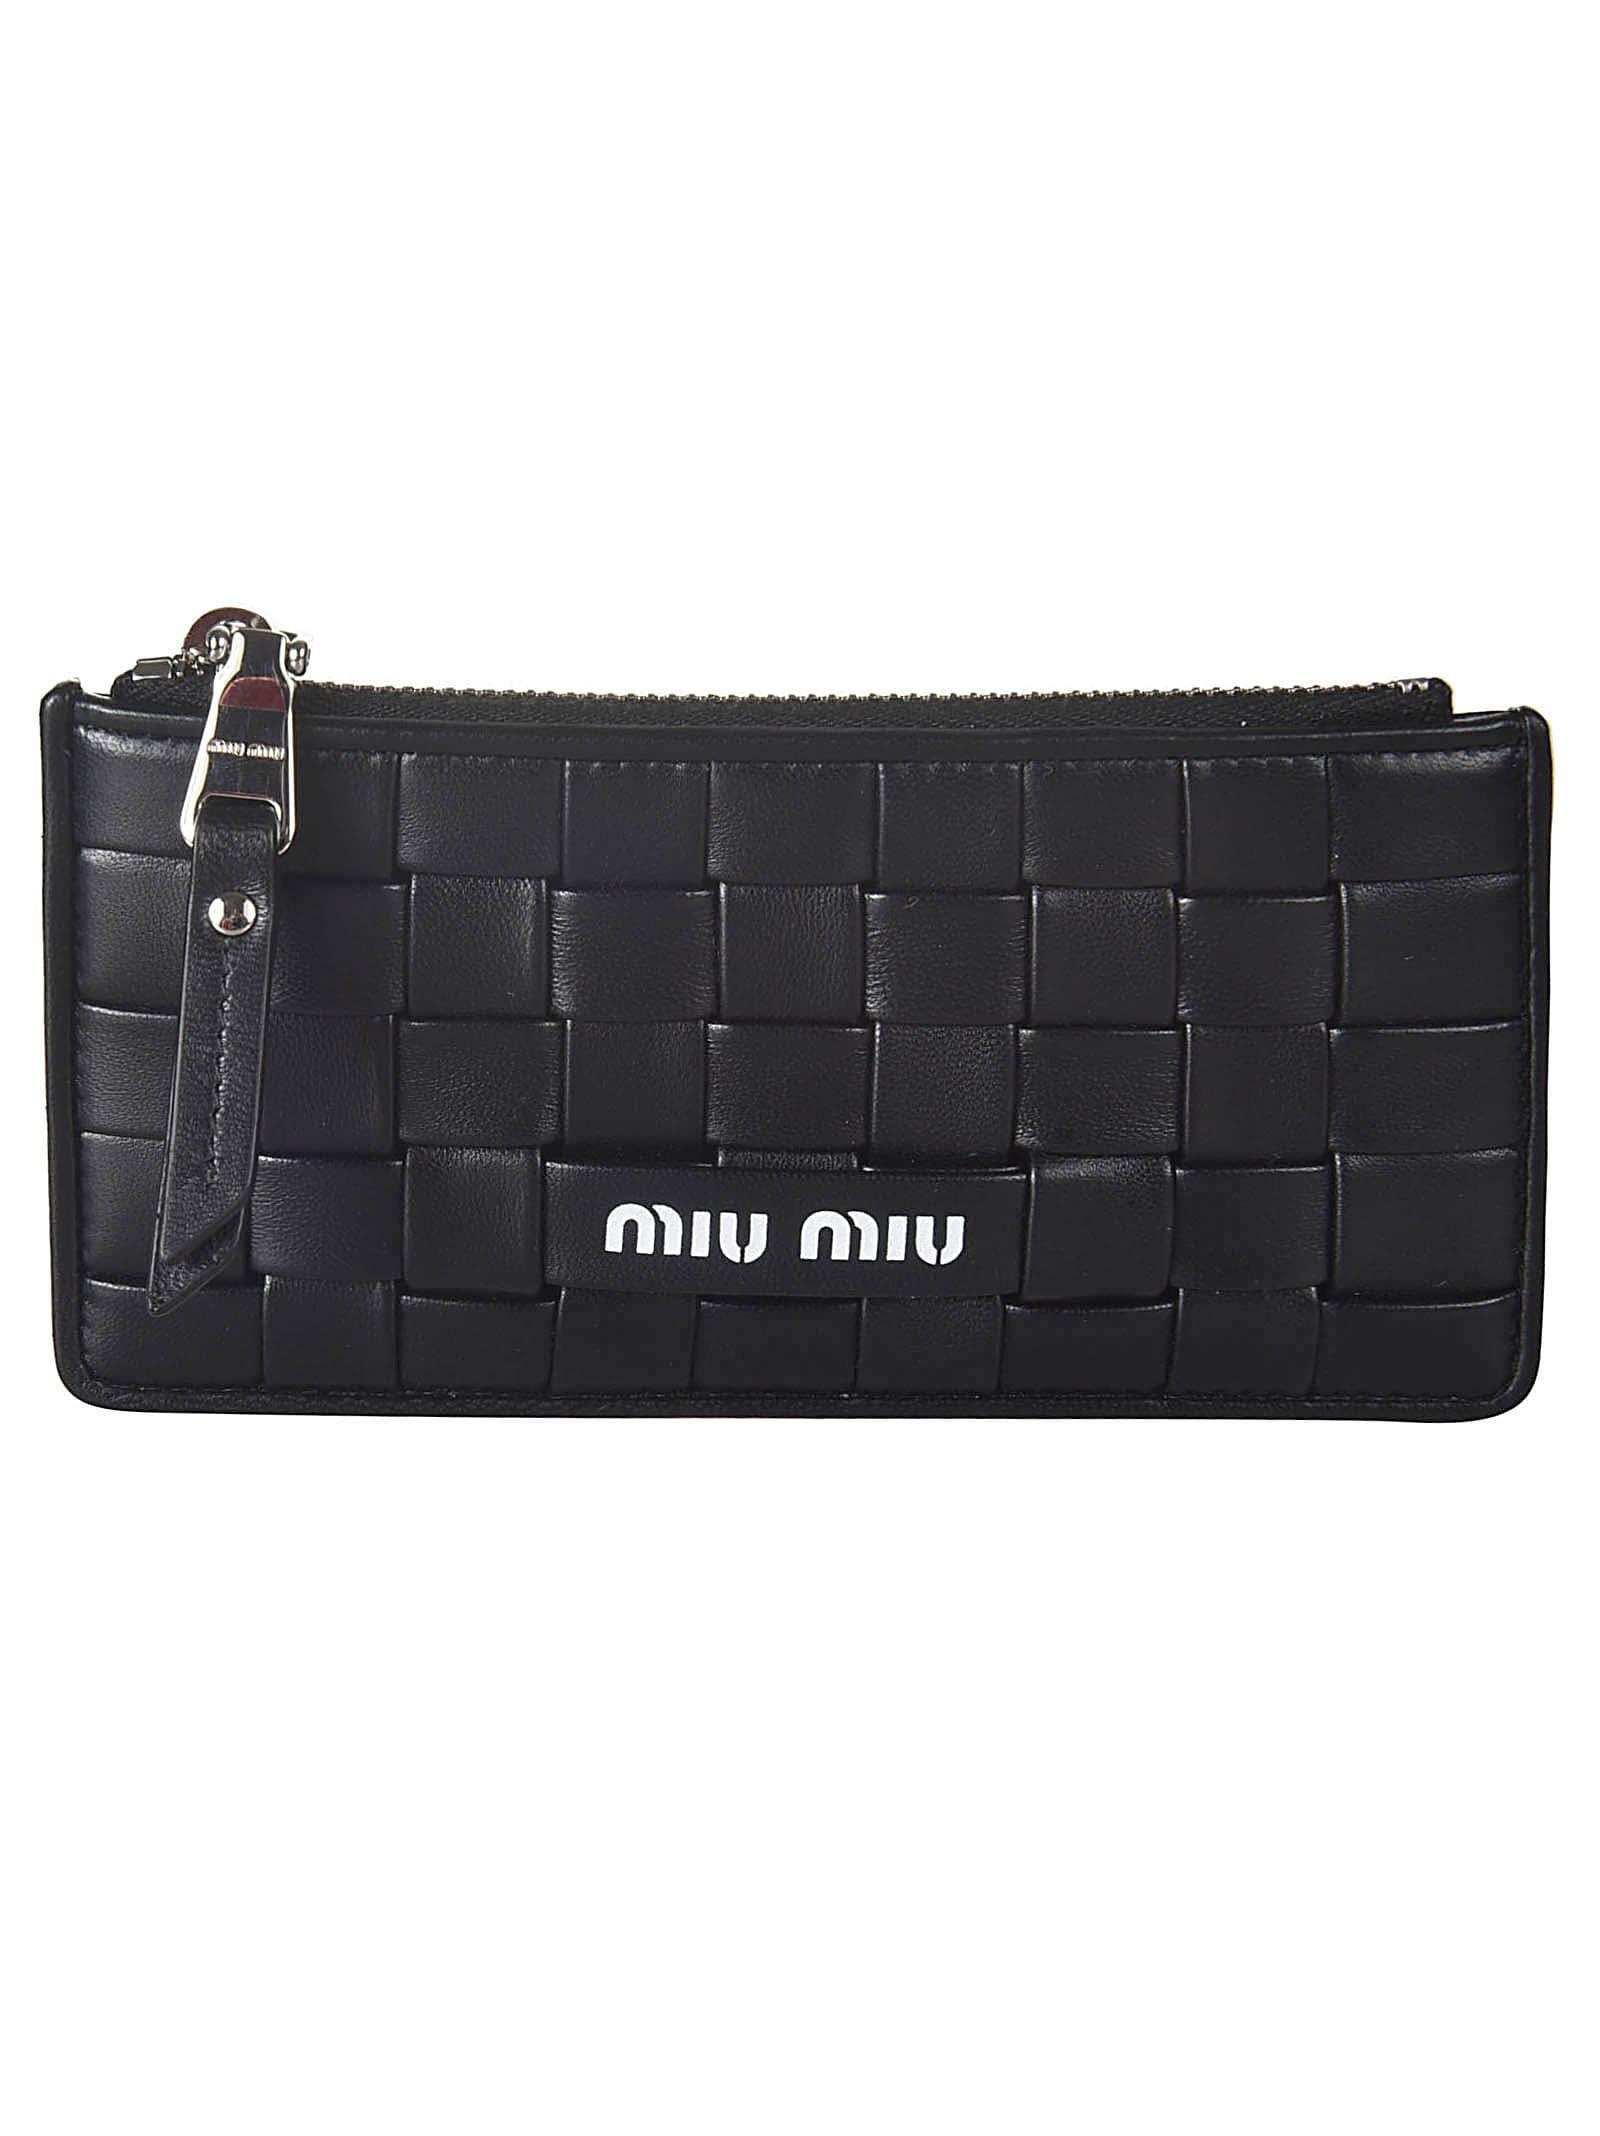 Miu Miu Zipped Woven Card Holder